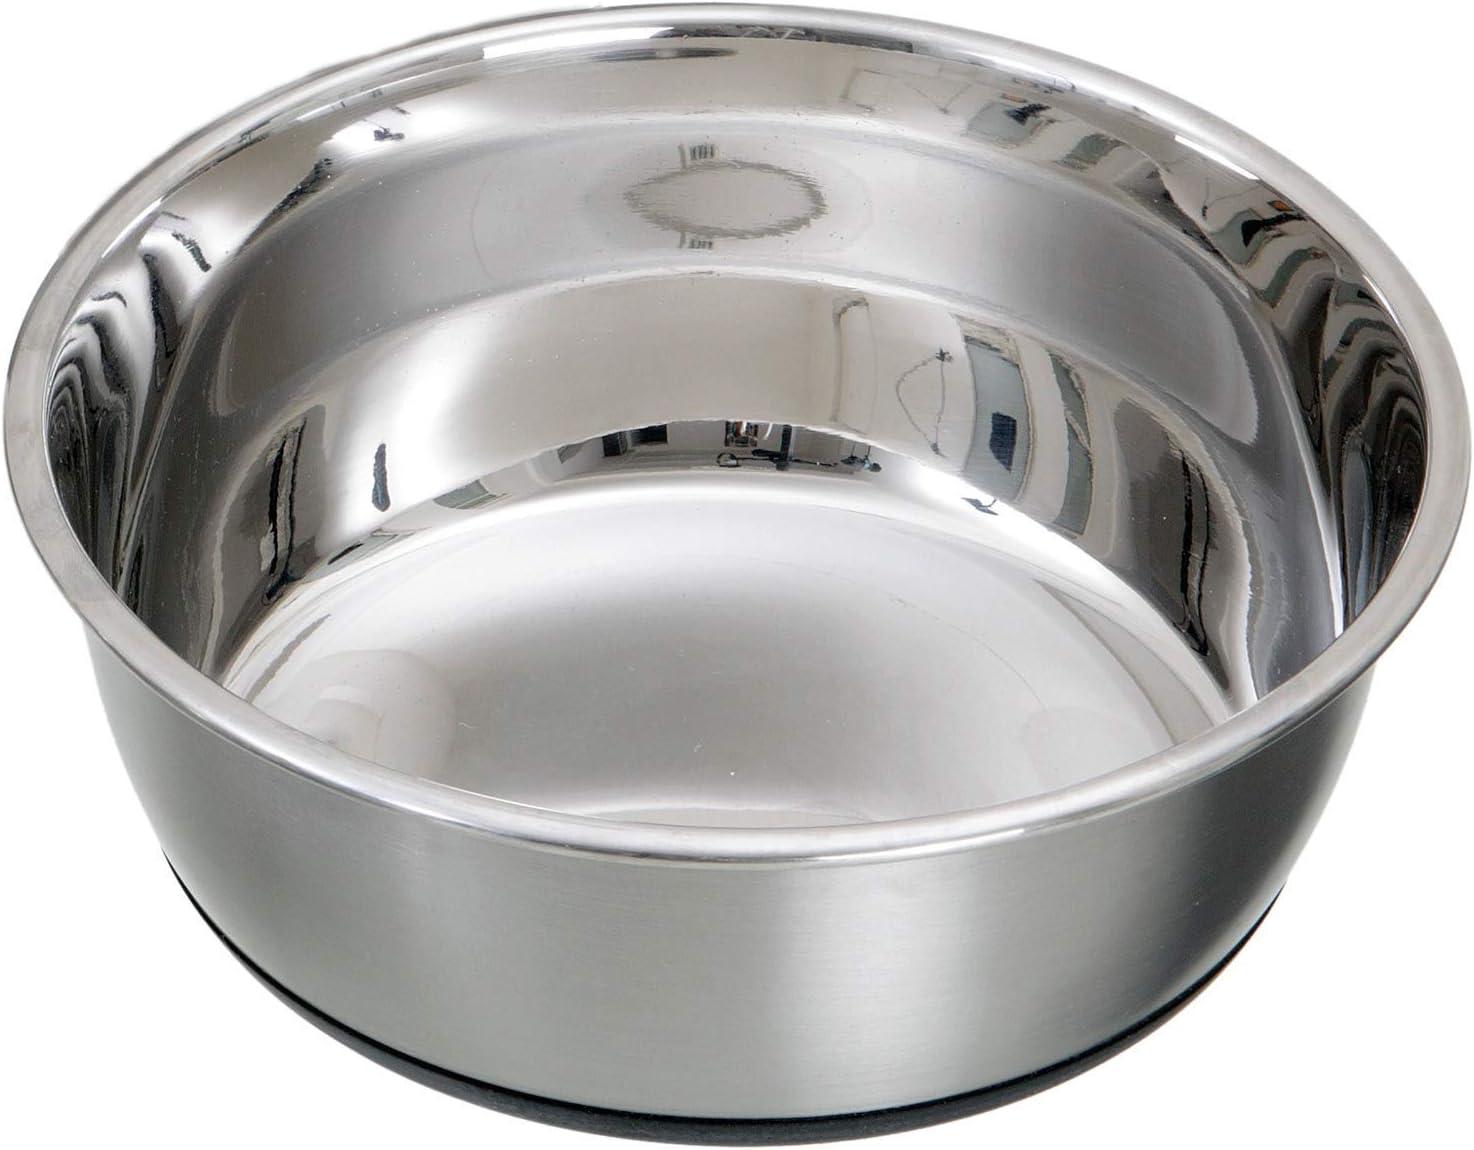 Karlie Acciaio Inossidabile Selecta Dog Bowl